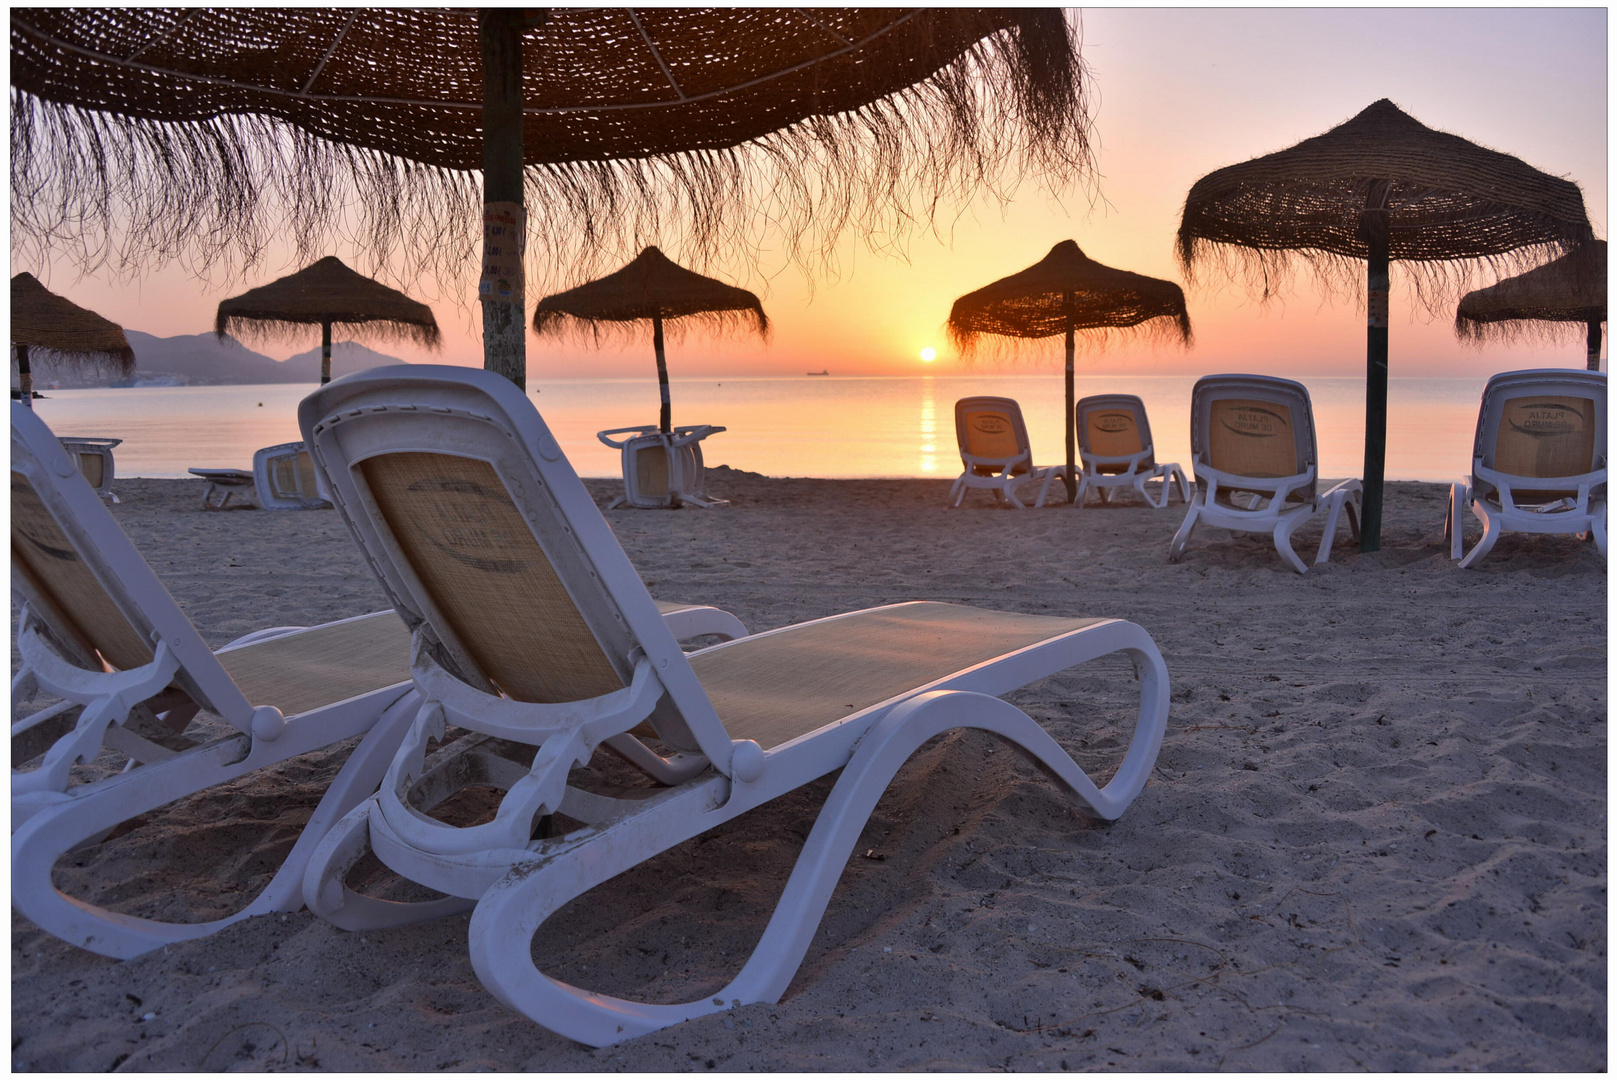 Mallorca 2012, Amanecer III (am Morgen III)